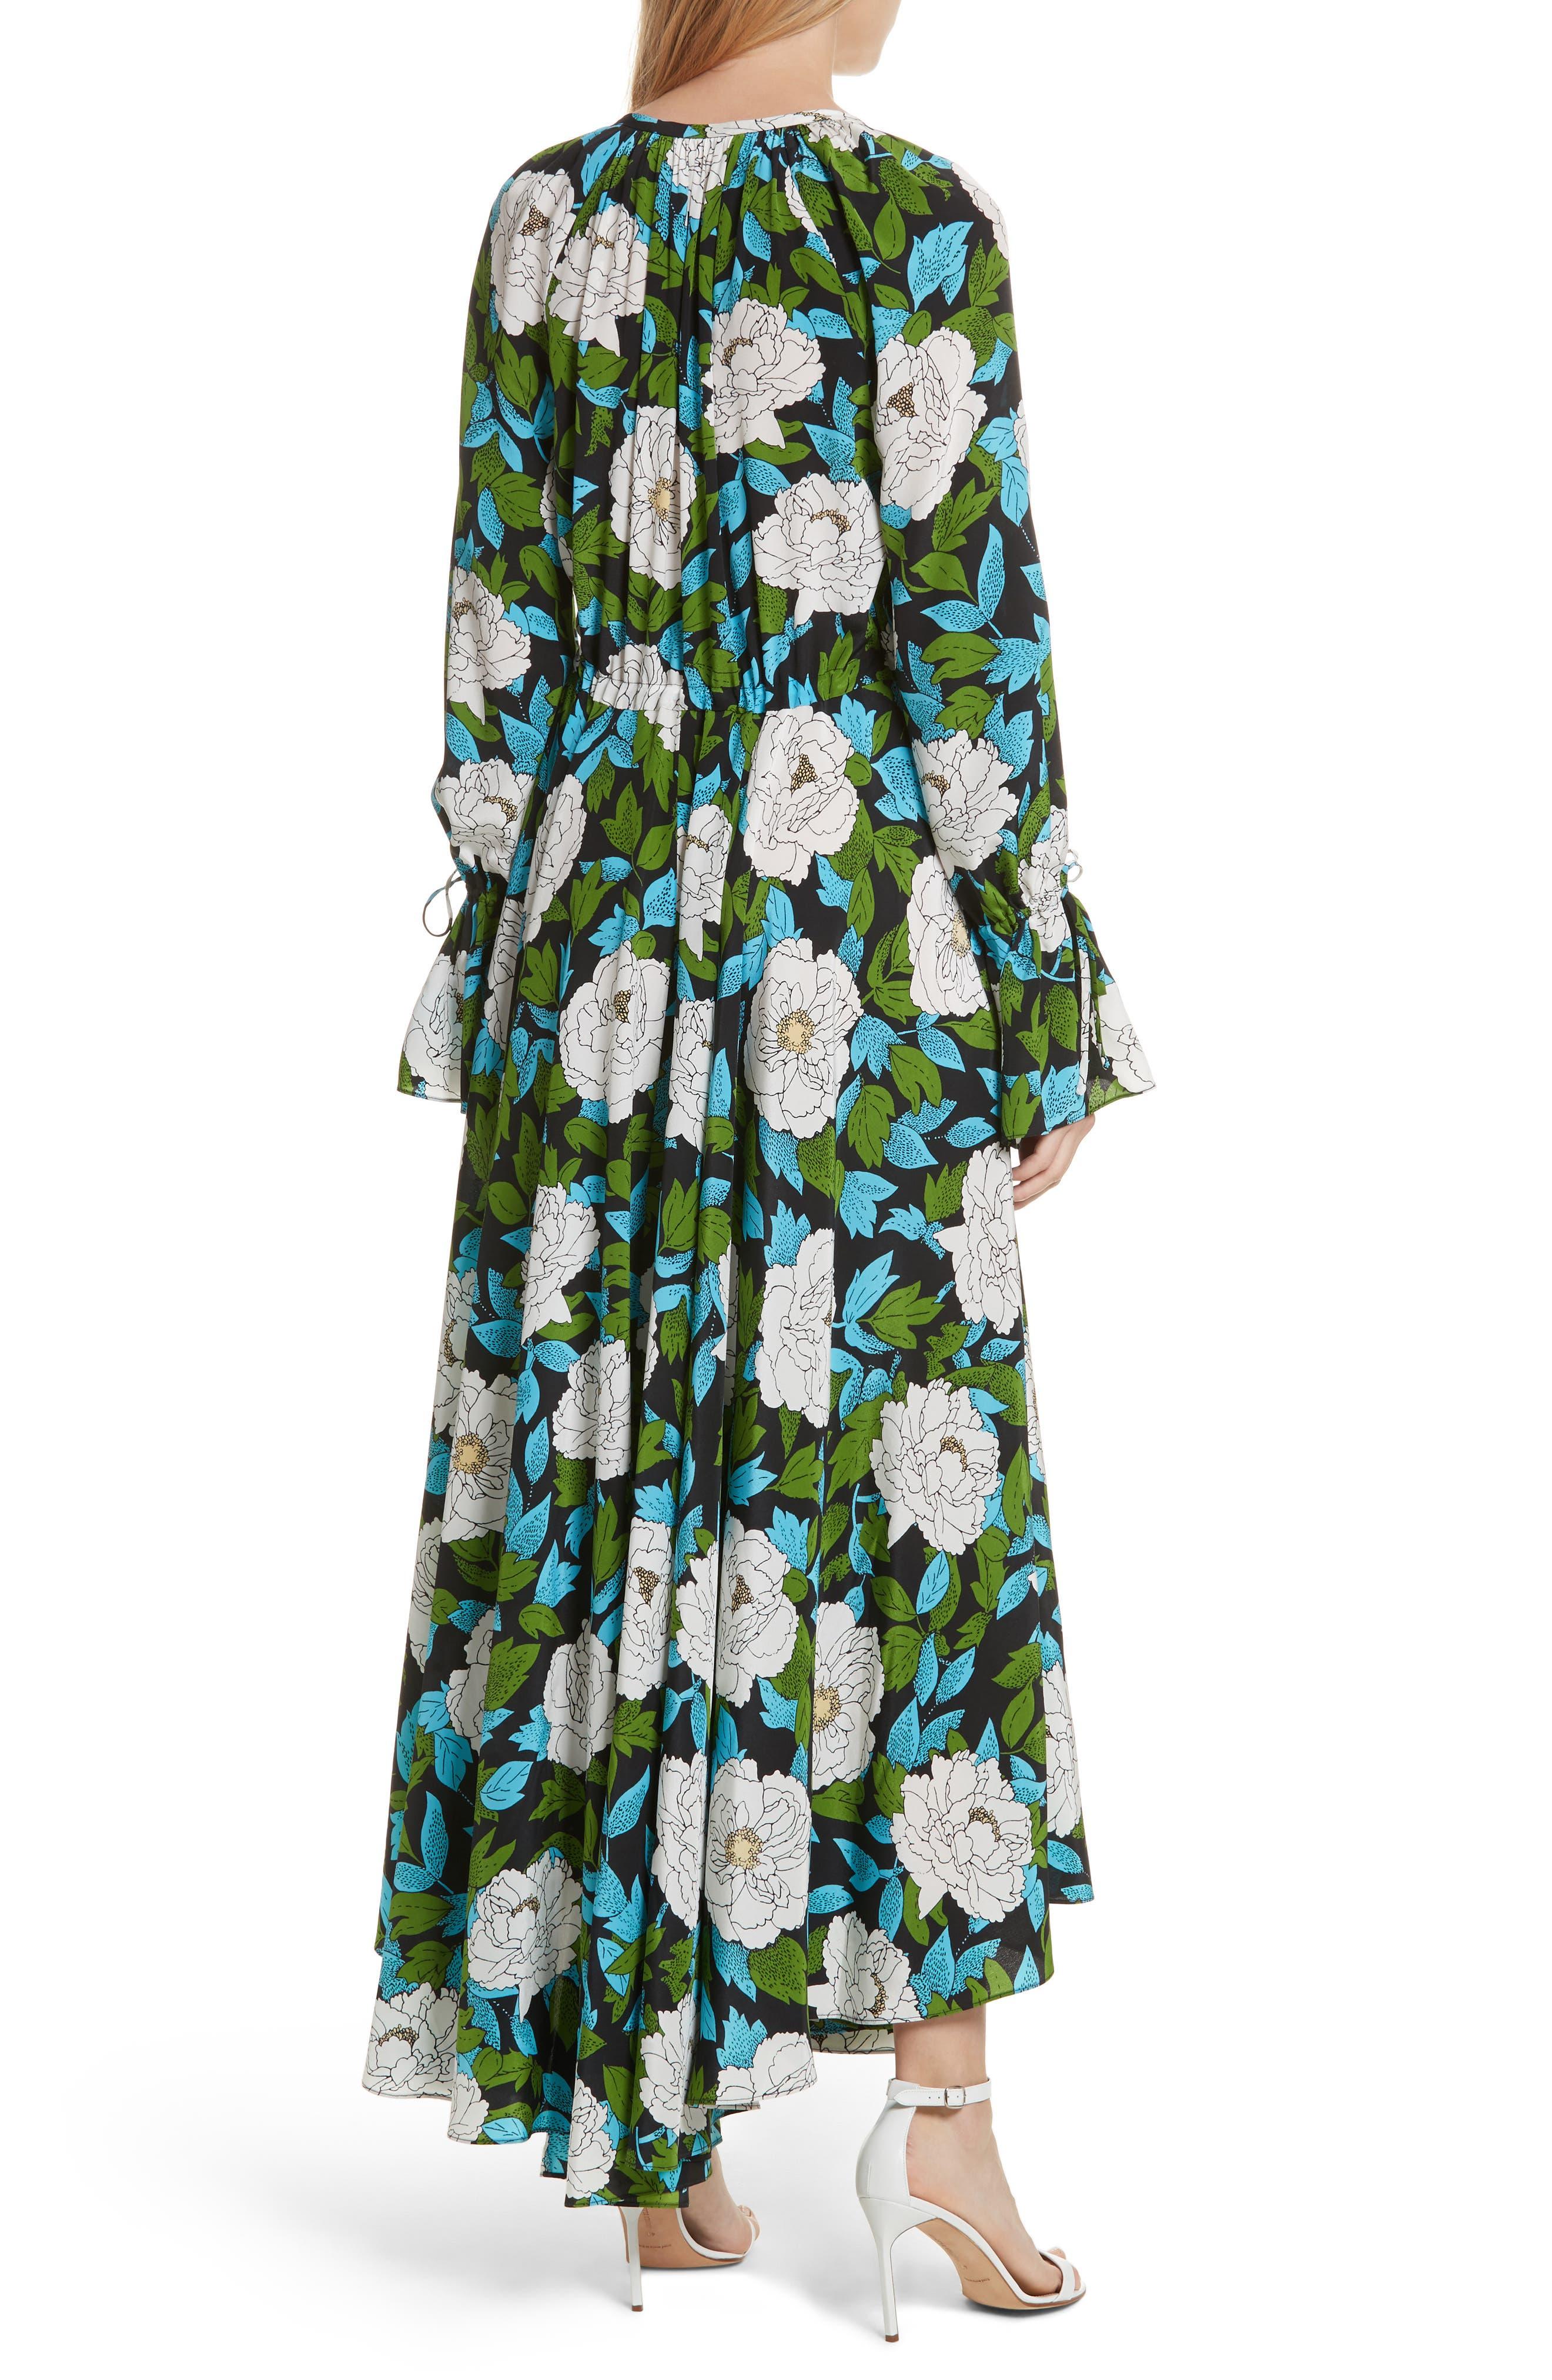 Diane von Furstenberg Floral Silk Maxi Dress,                             Alternate thumbnail 2, color,                             389